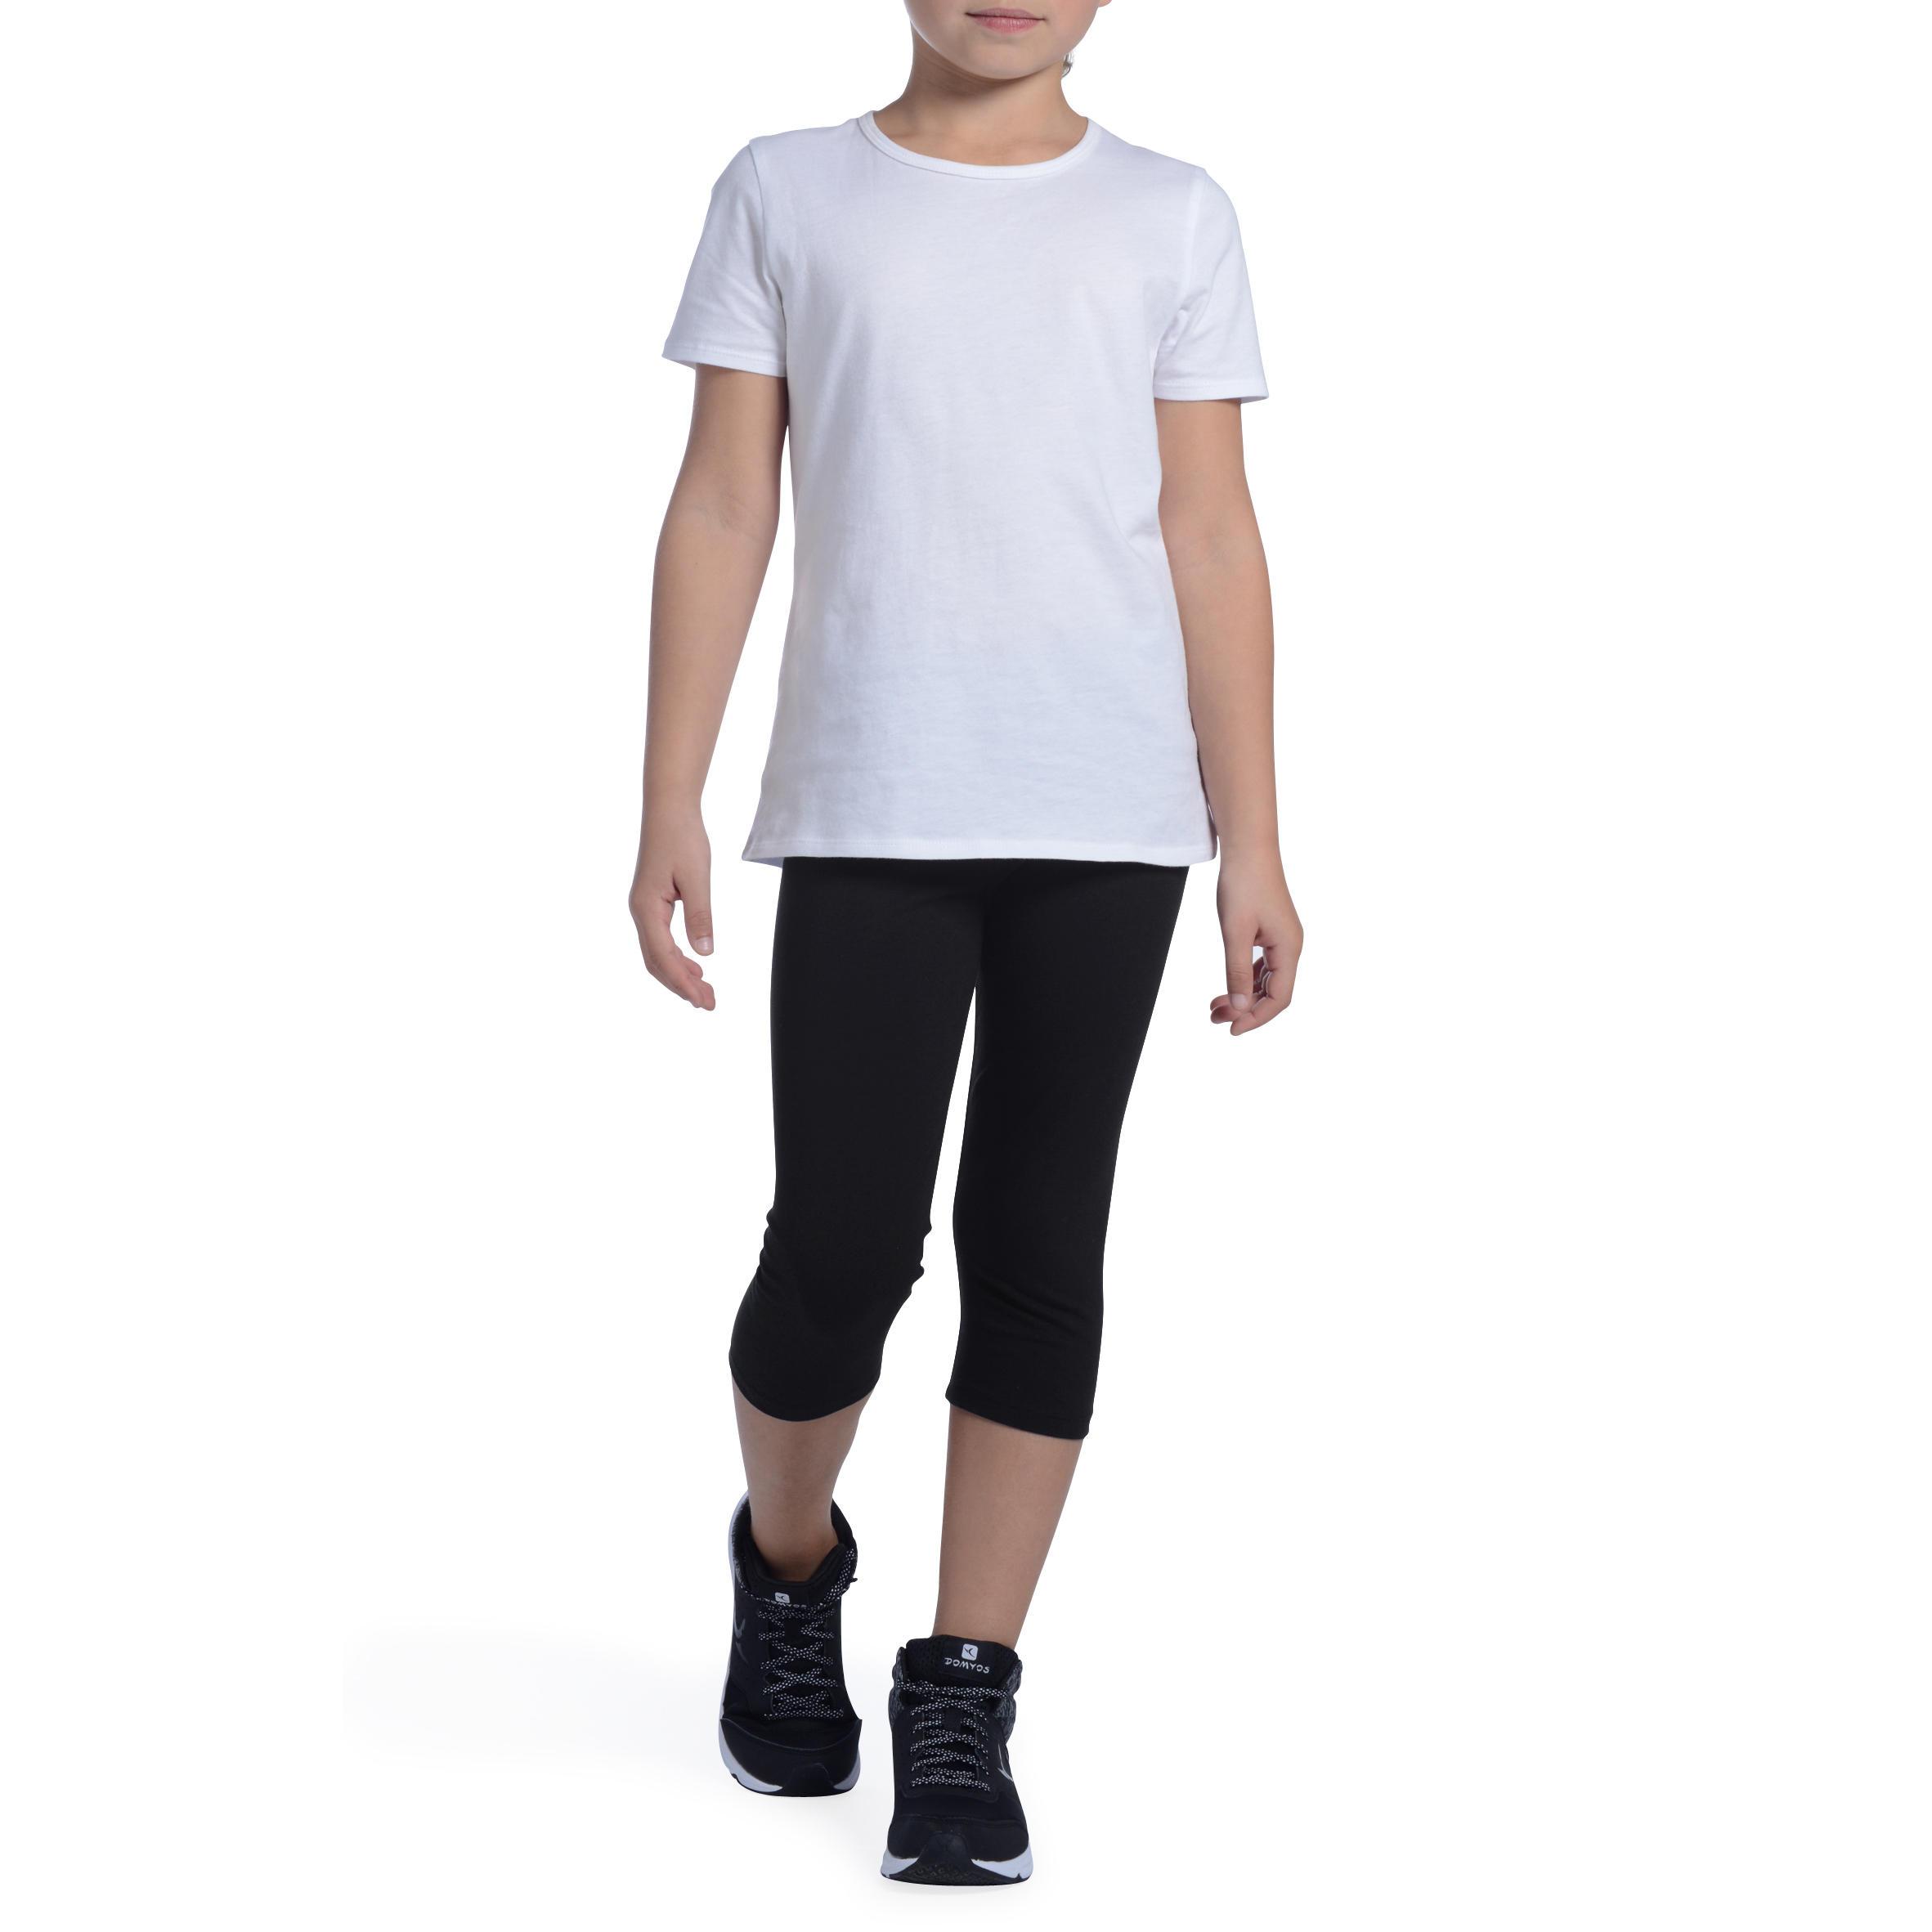 Girls' Gym Cropped Bottoms - Black